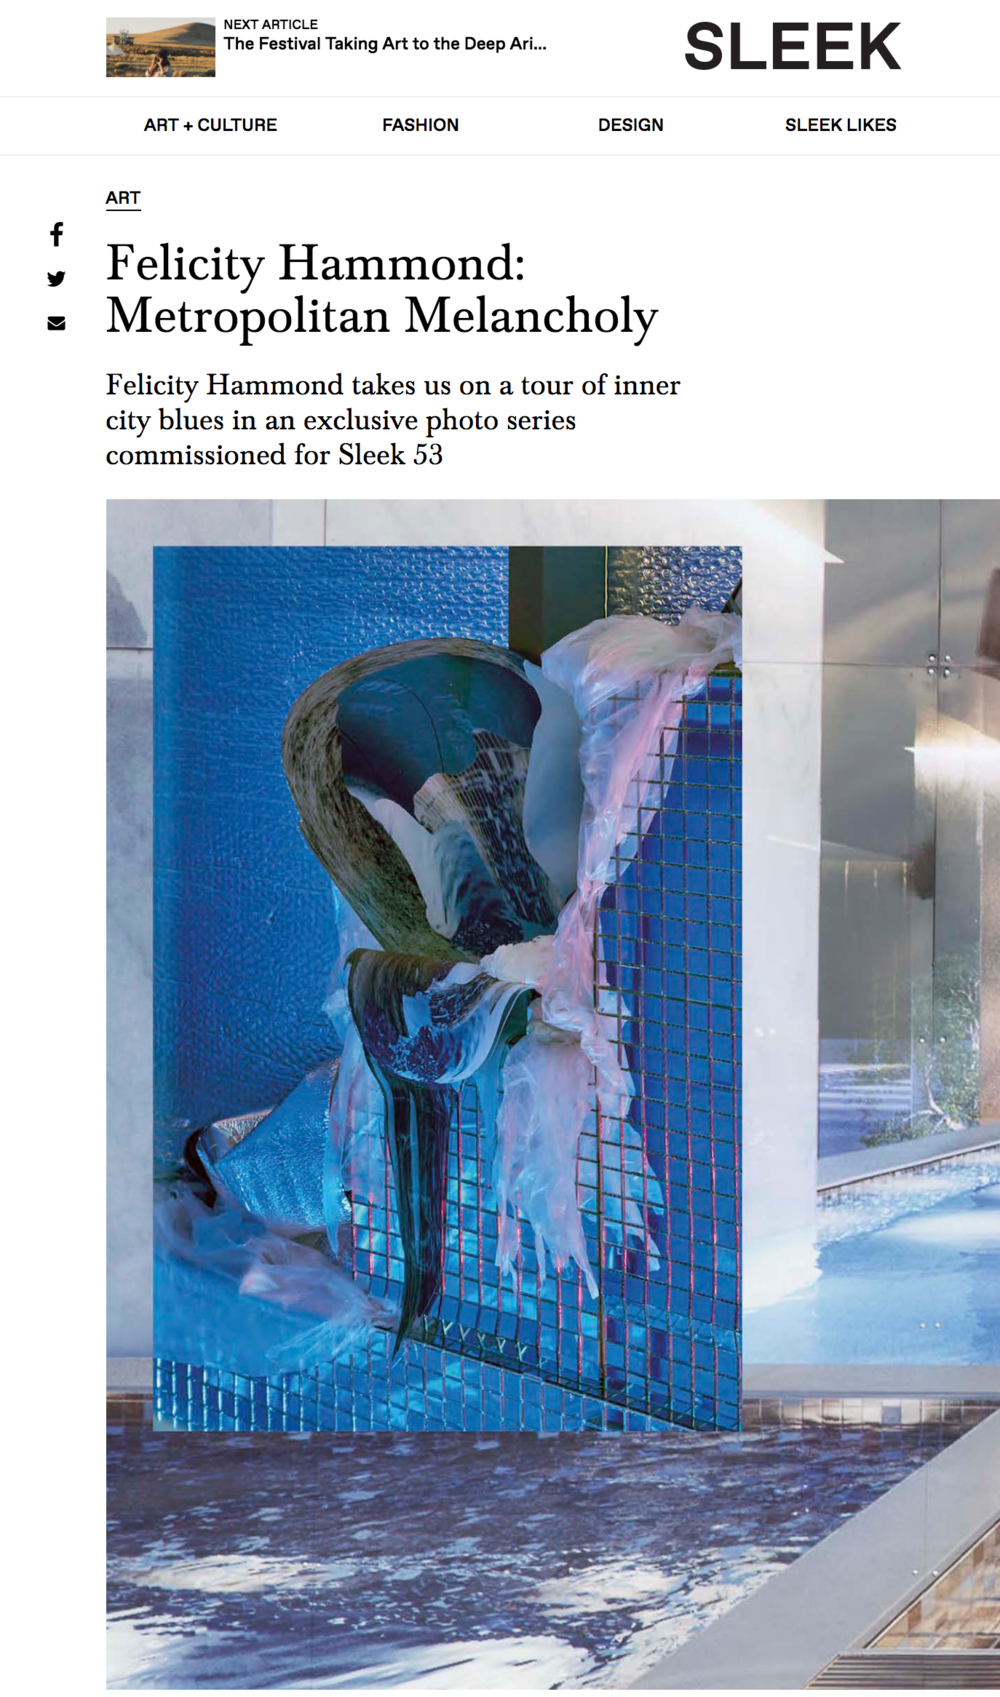 http://www.sleek-mag.com/2017/03/13/felicity-hammond-metropolitan-melancholy/